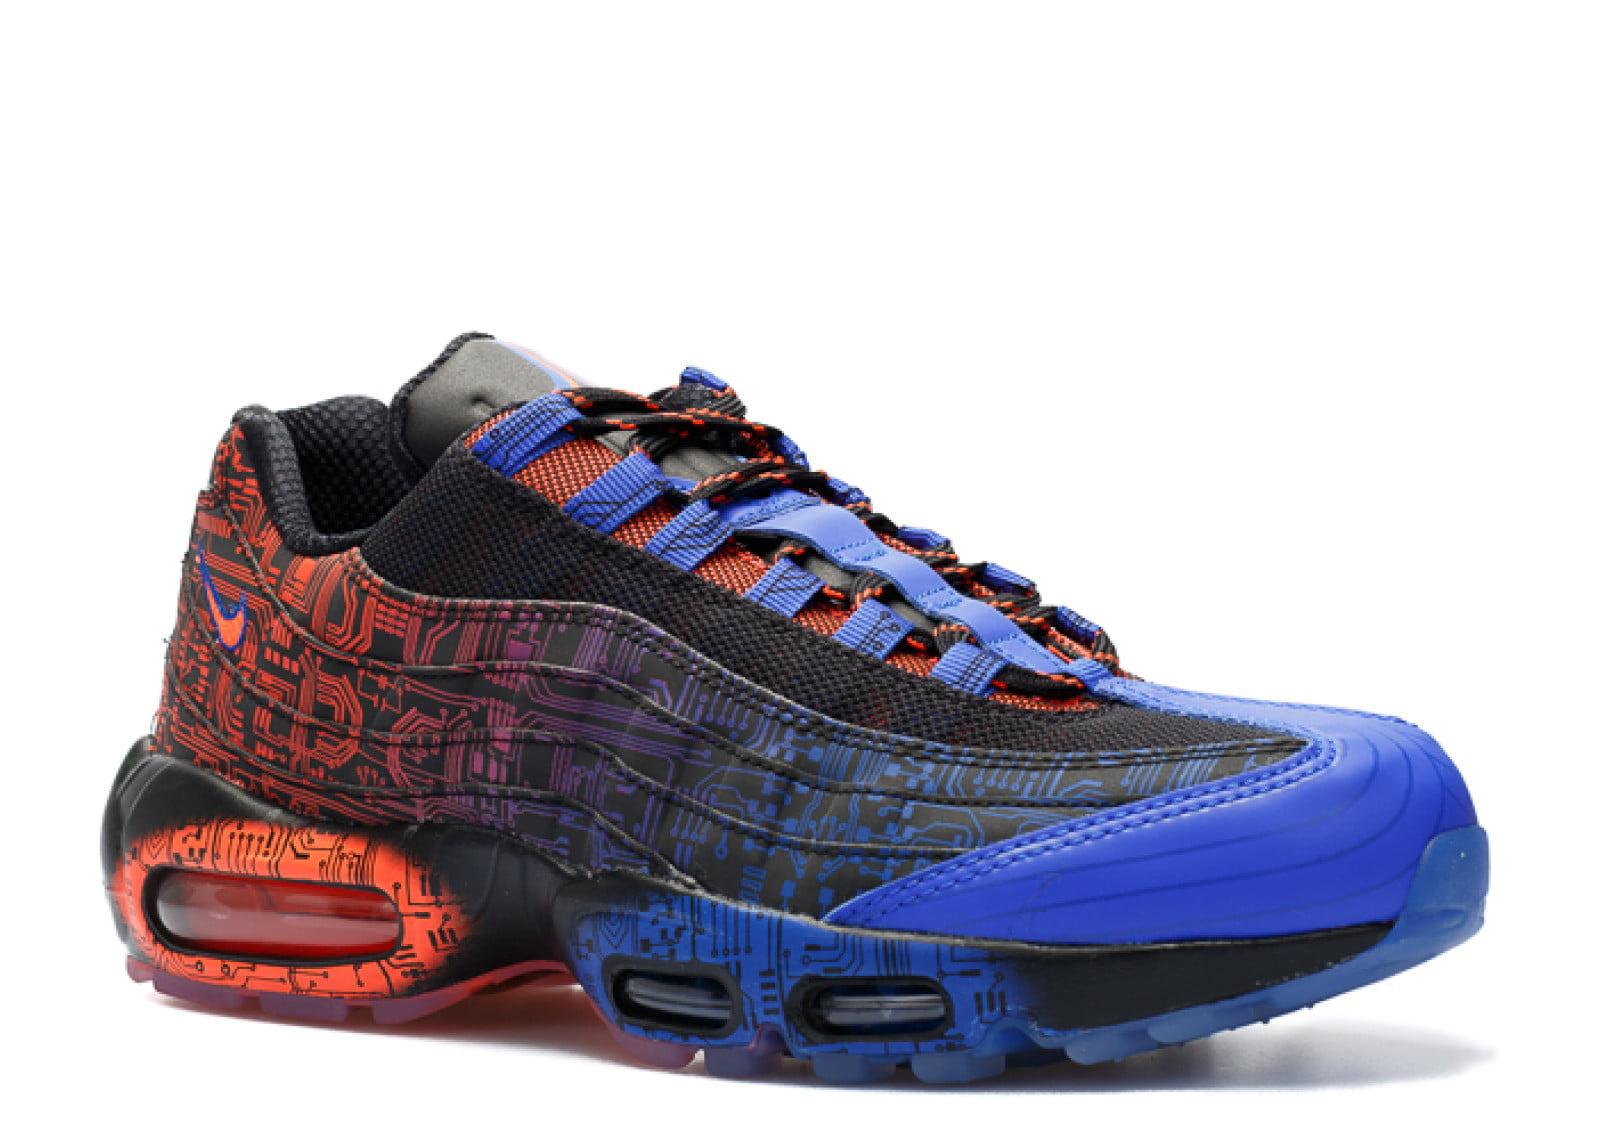 76d1d57cceb Nike - Men - Air Max 95 Premium Db  Doernbecher  - 839165-064 - Size 7.5